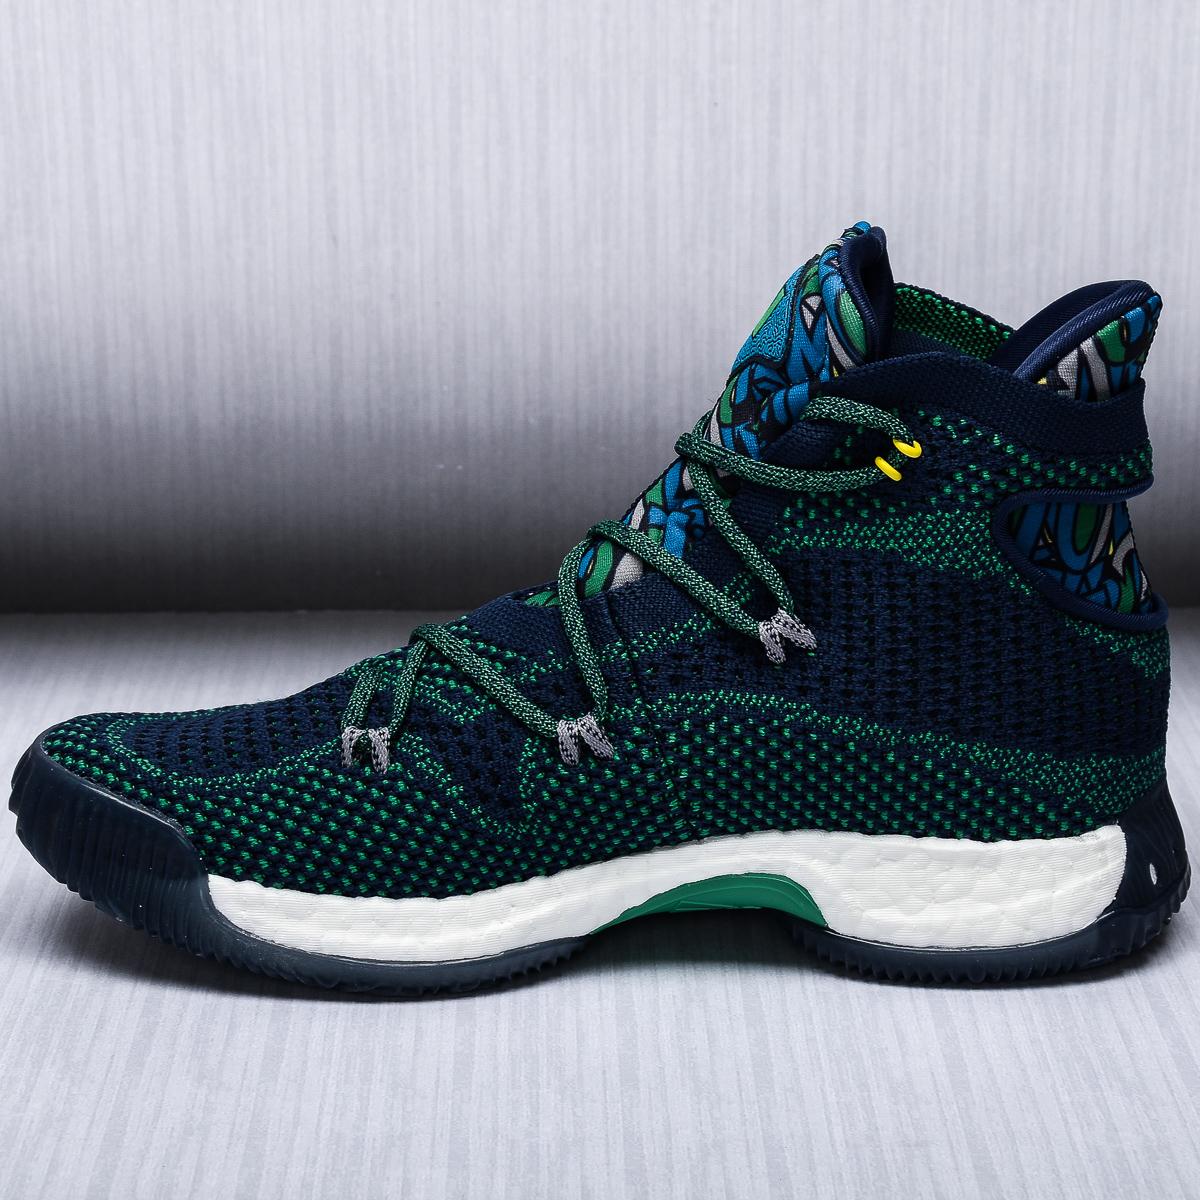 Adidas Menns Basketball Gal Eksplosiv Primeknit Sko VhjLJySH3